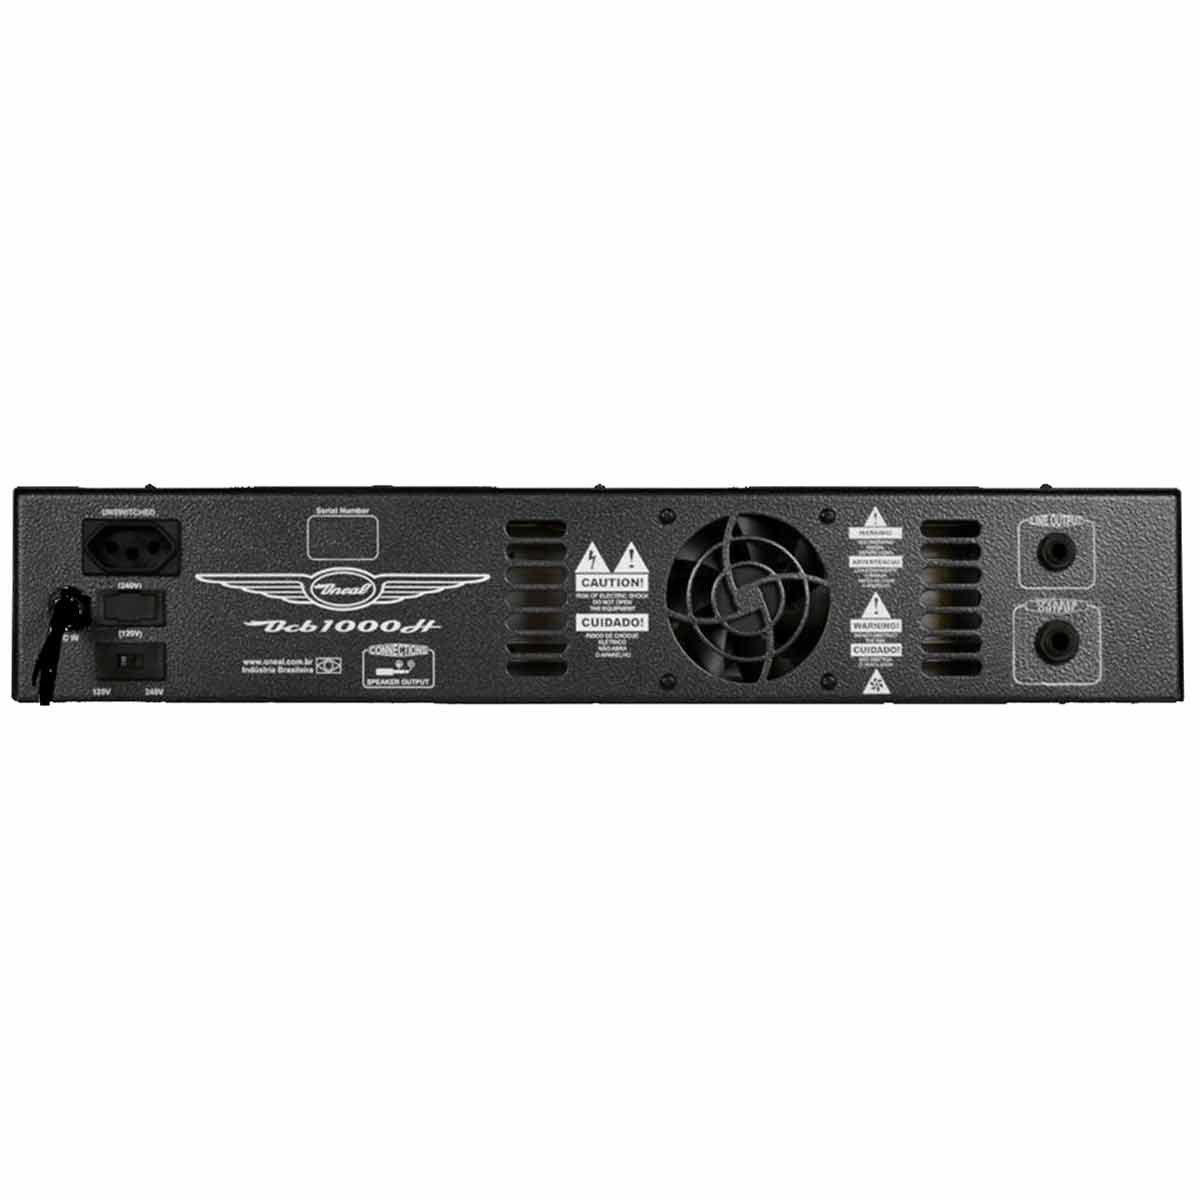 Cabeçote p/ Contrabaixo 350W - OCB 1000 H Oneal